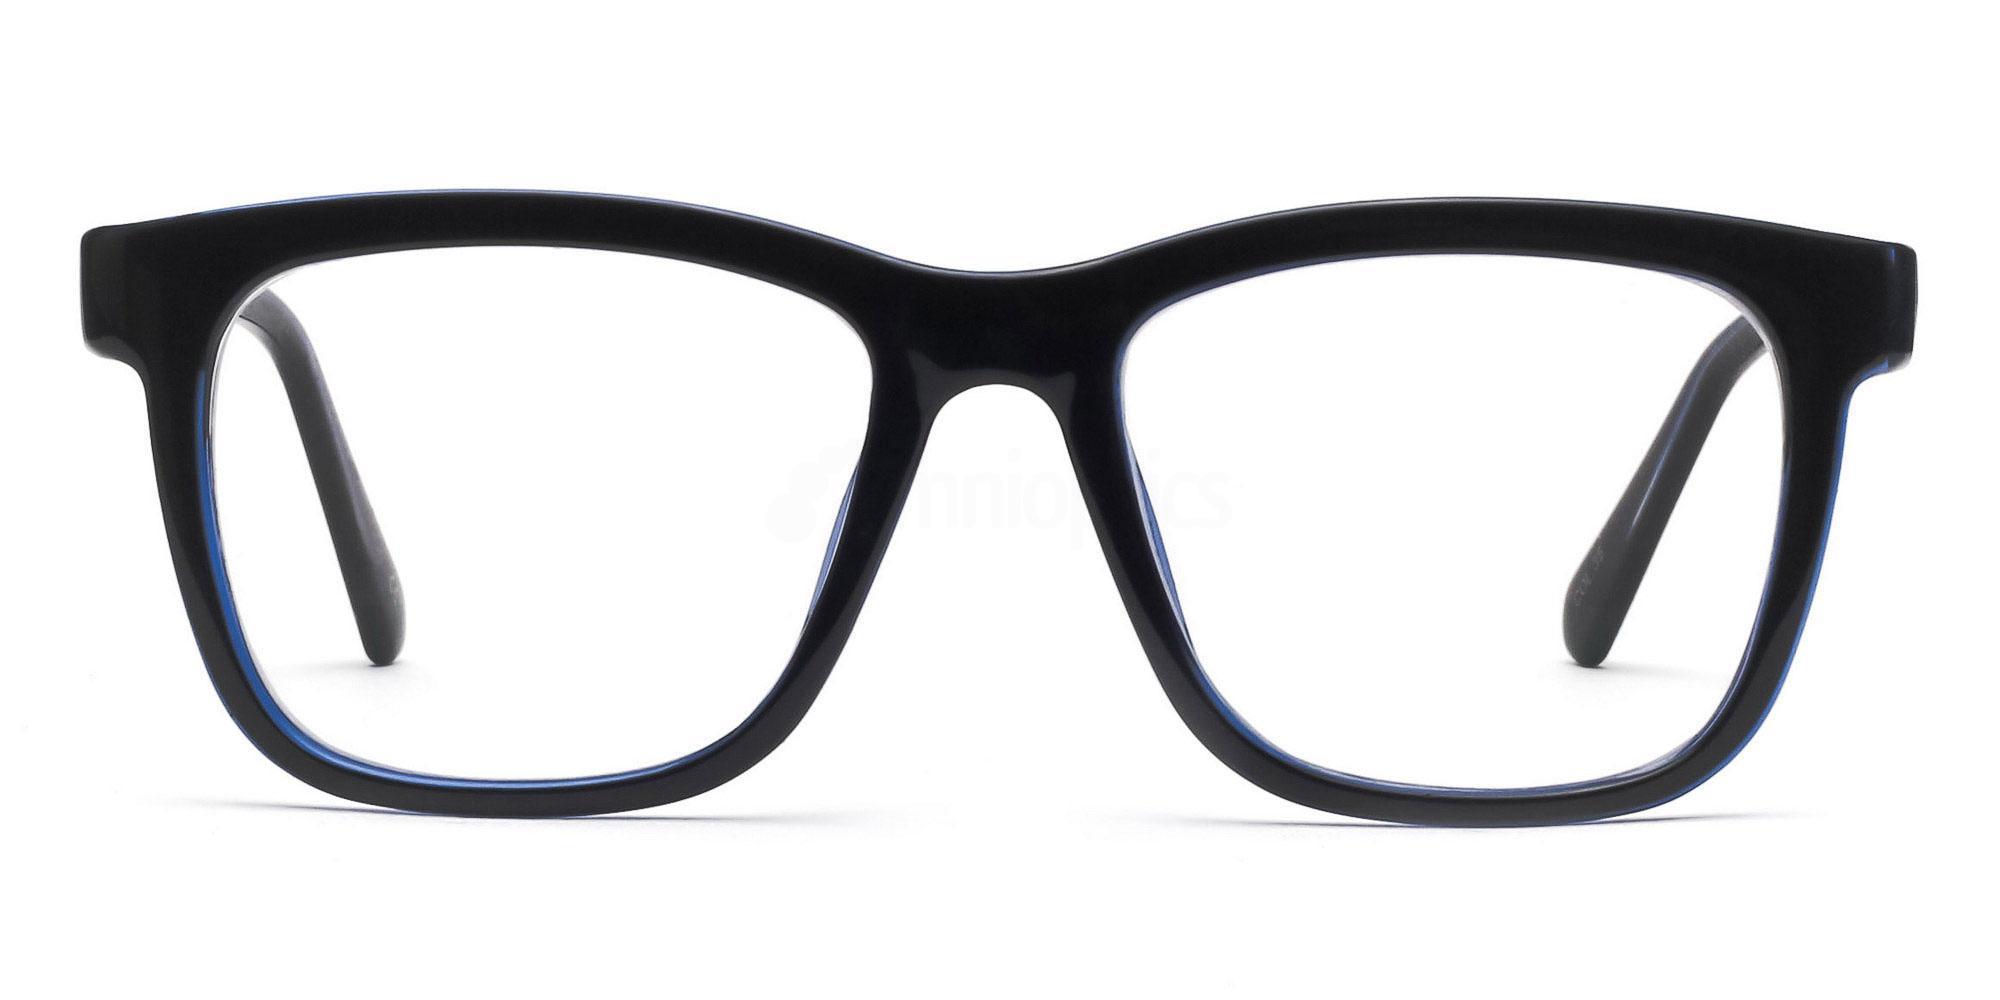 COL.35 2444 - Black and Blue Glasses, Savannah